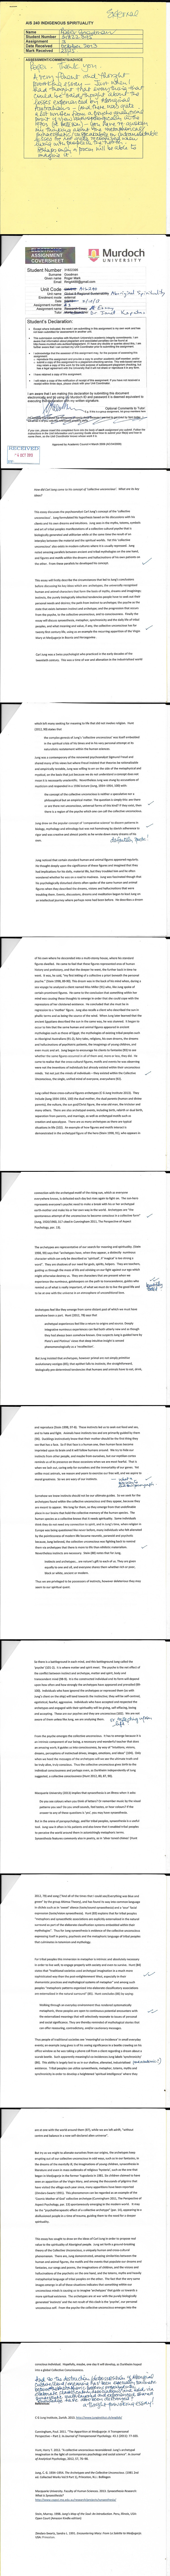 RGoodman 2013 Essay on Indigenous Spirit